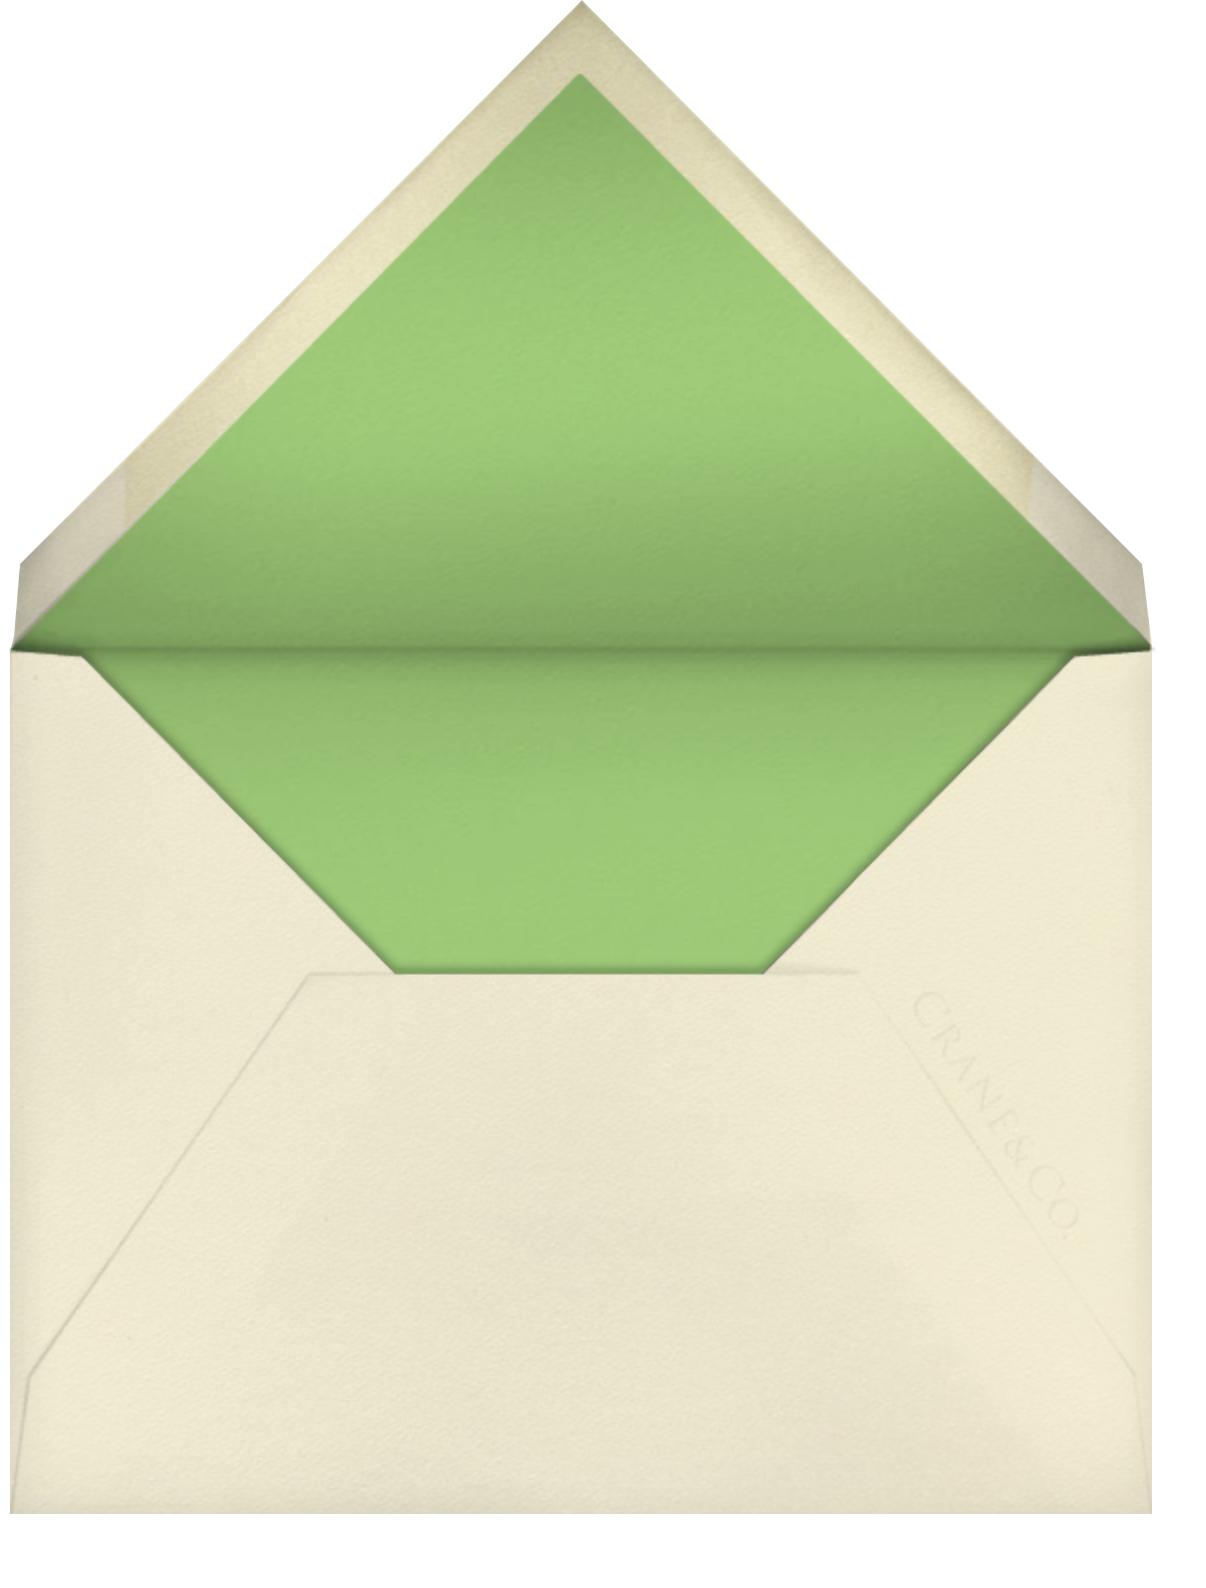 Typographic I - kate spade new york - All - envelope back